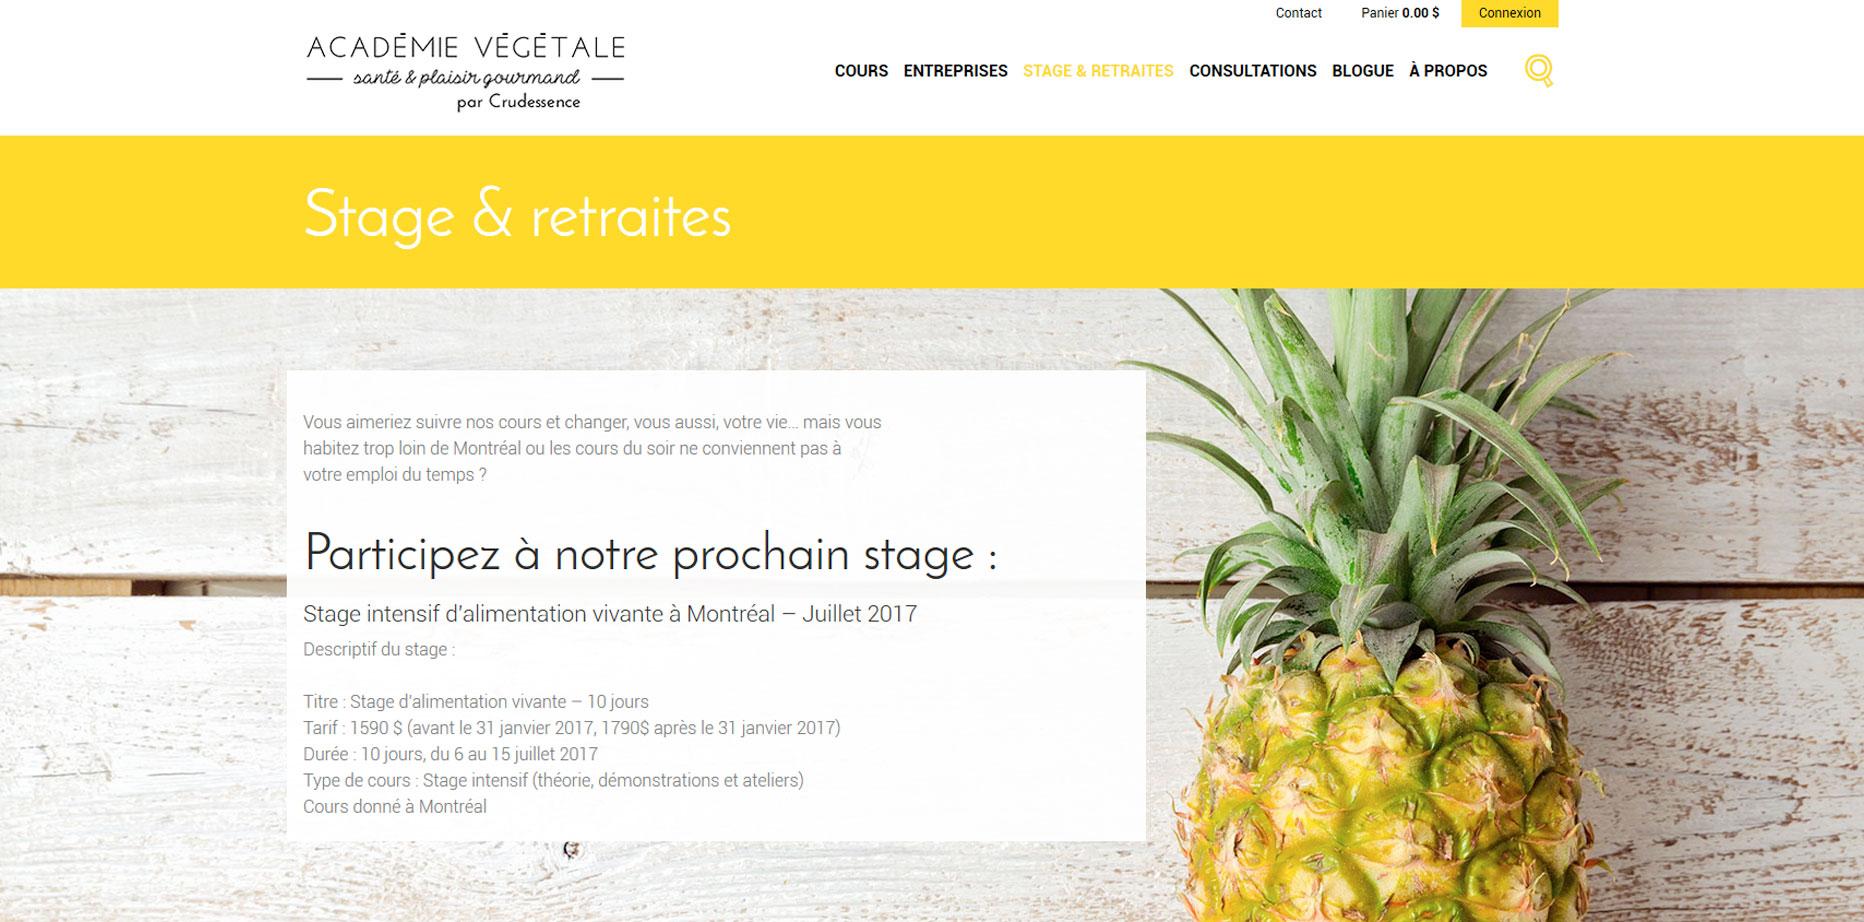 academie-vegetale5